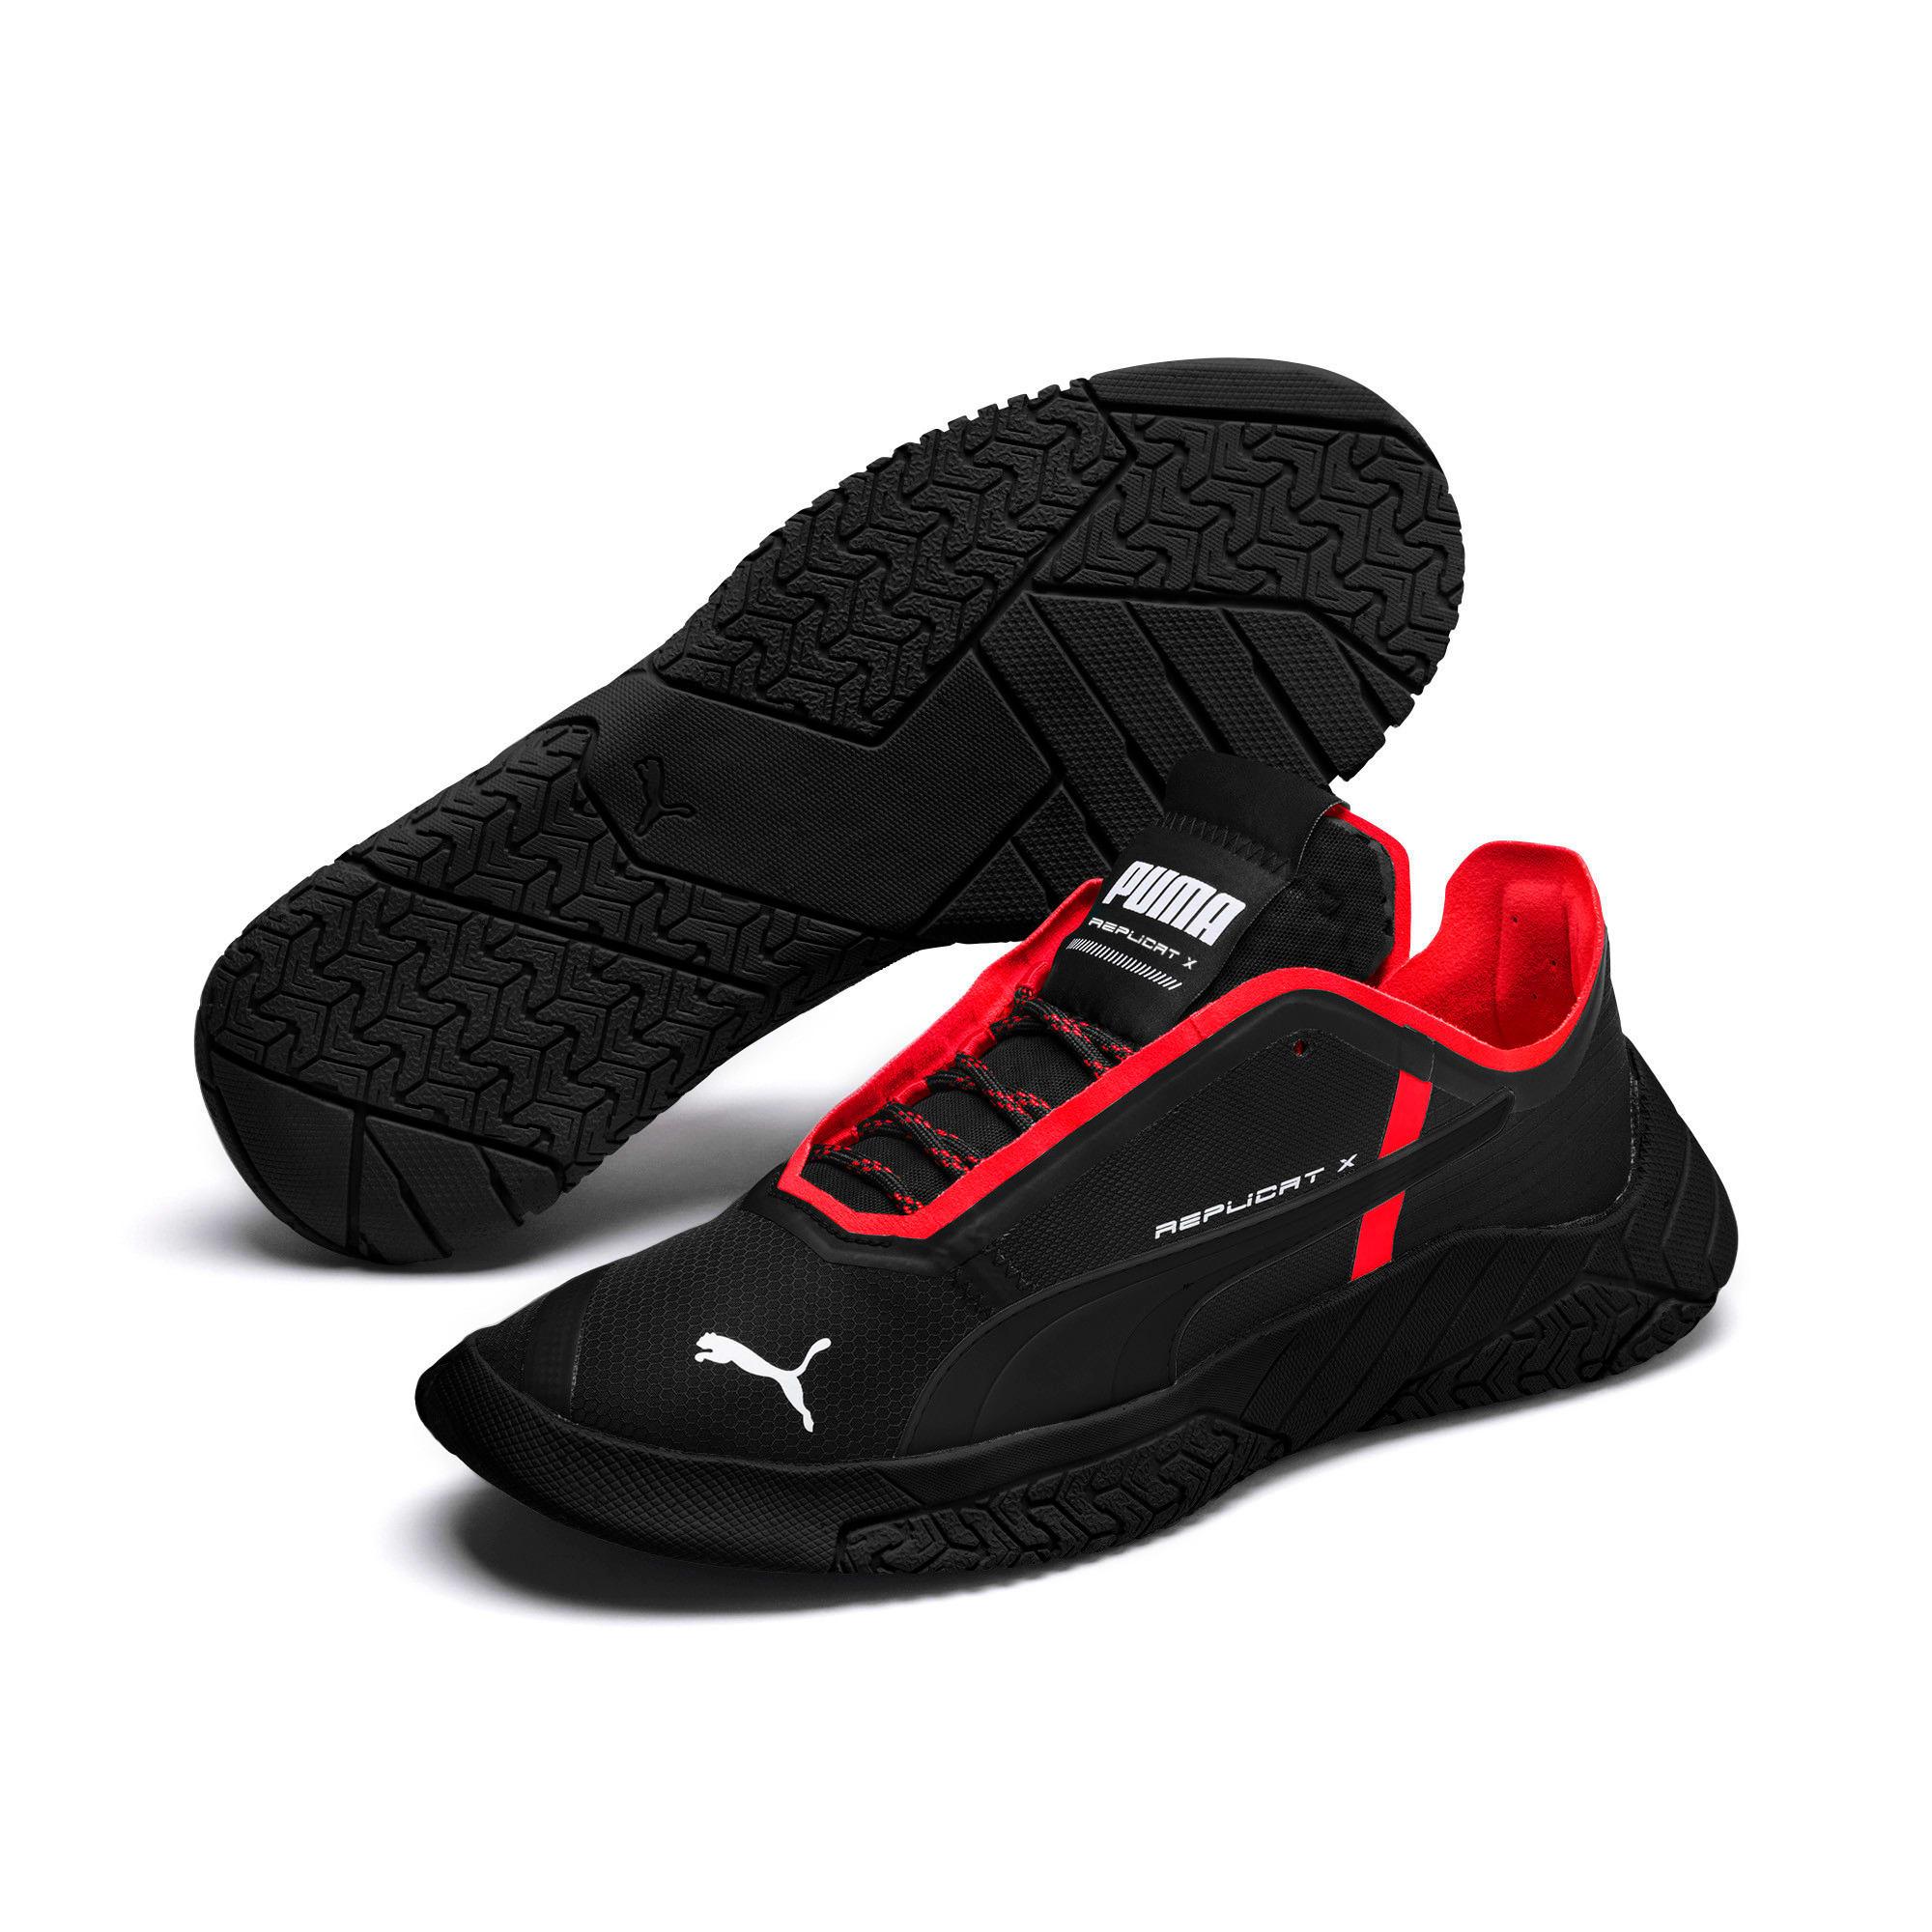 Thumbnail 7 of Replicat-X Circuit Trainers, Puma Black-Puma Red, medium-IND